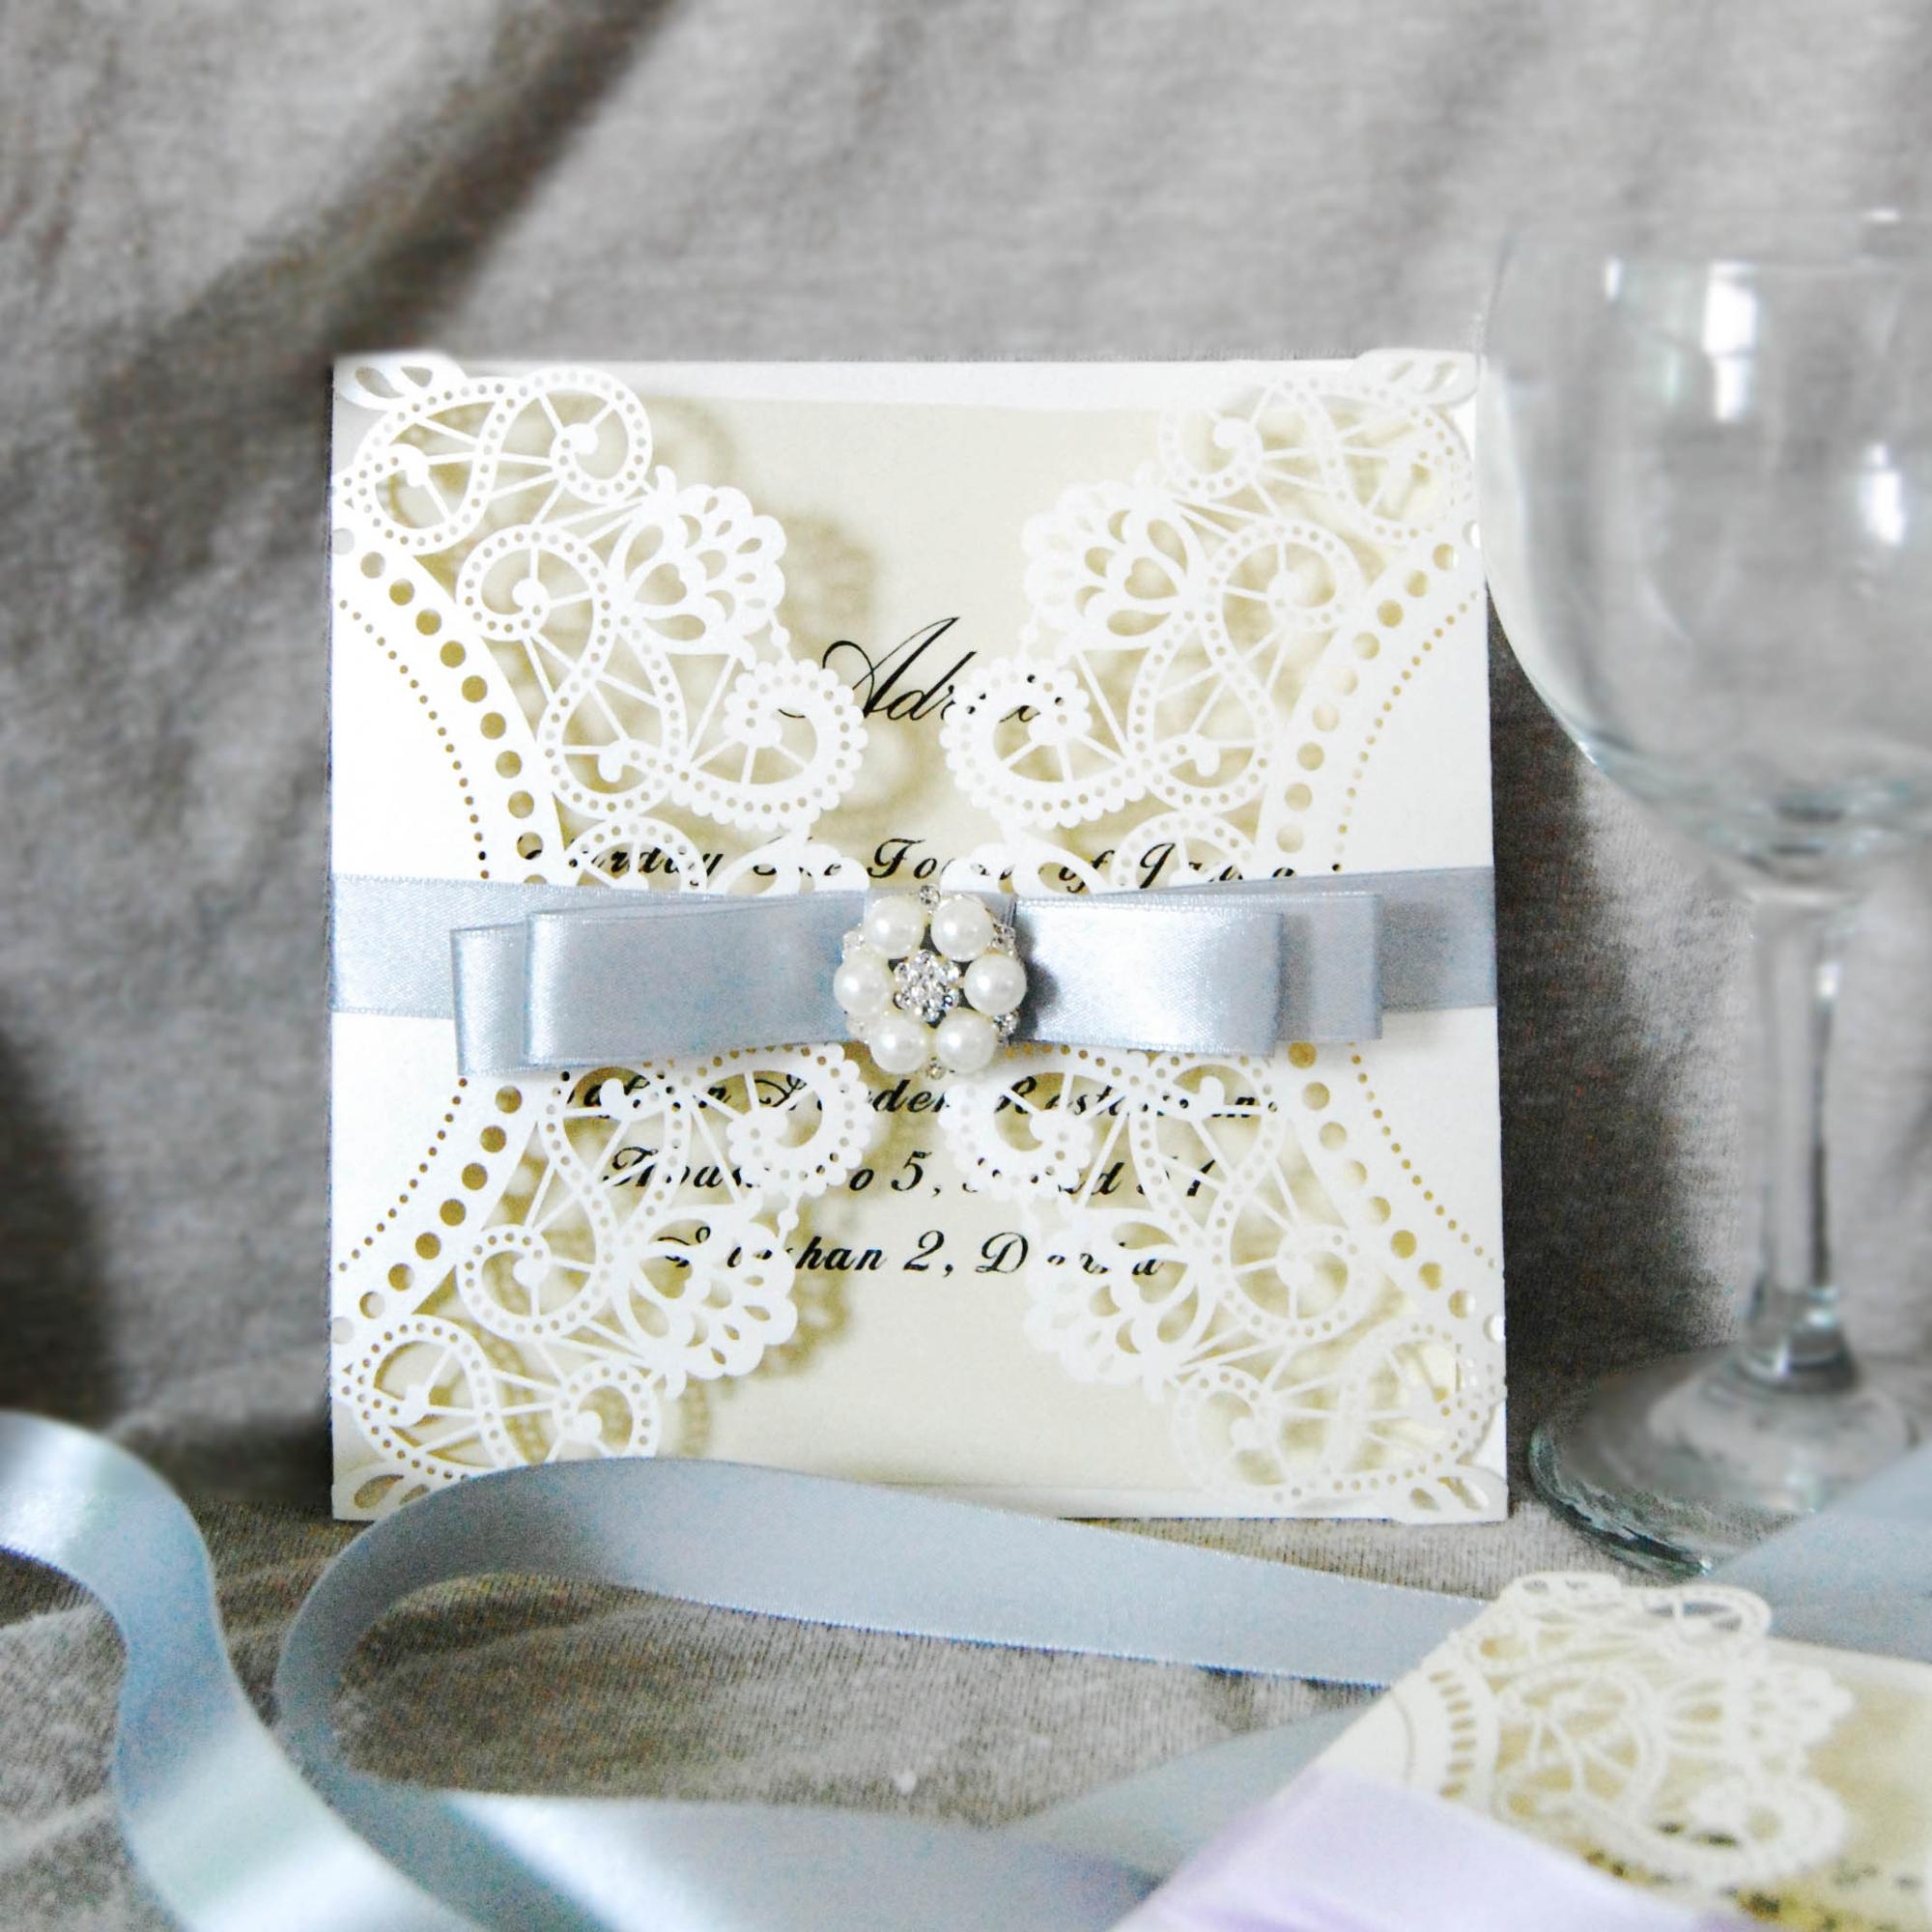 Popular style wedding card cheap envelopes for wedding invitations design rustic